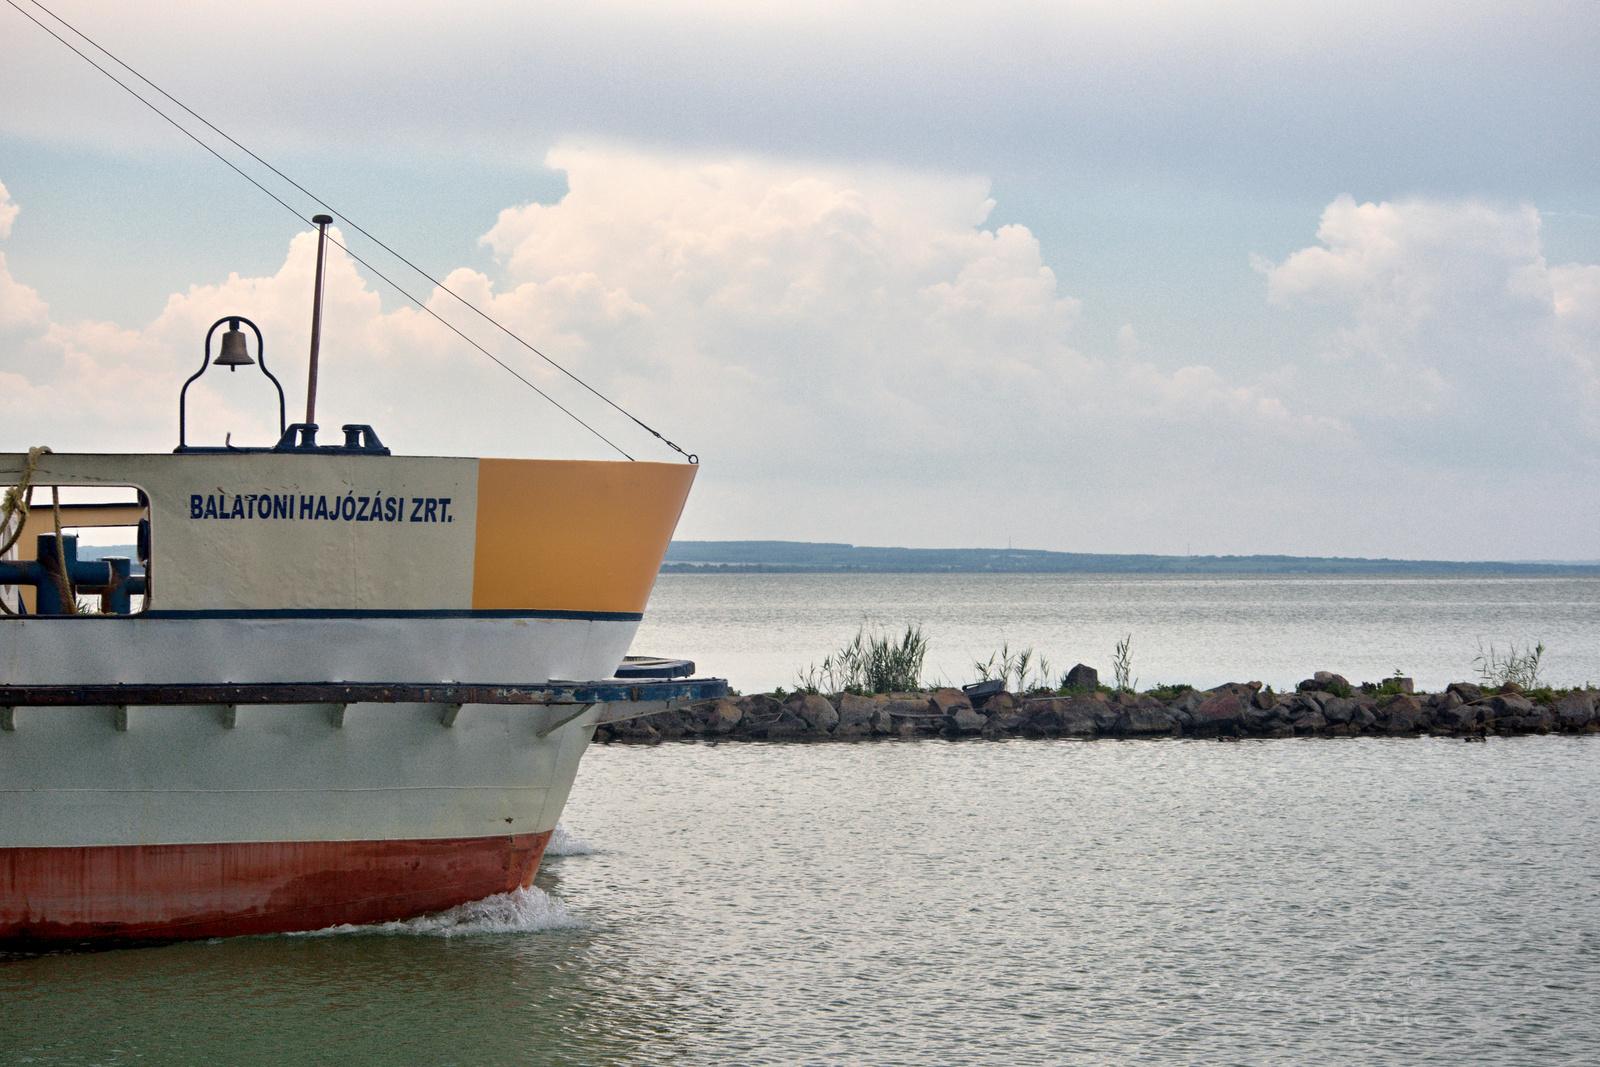 Balaton Hajó